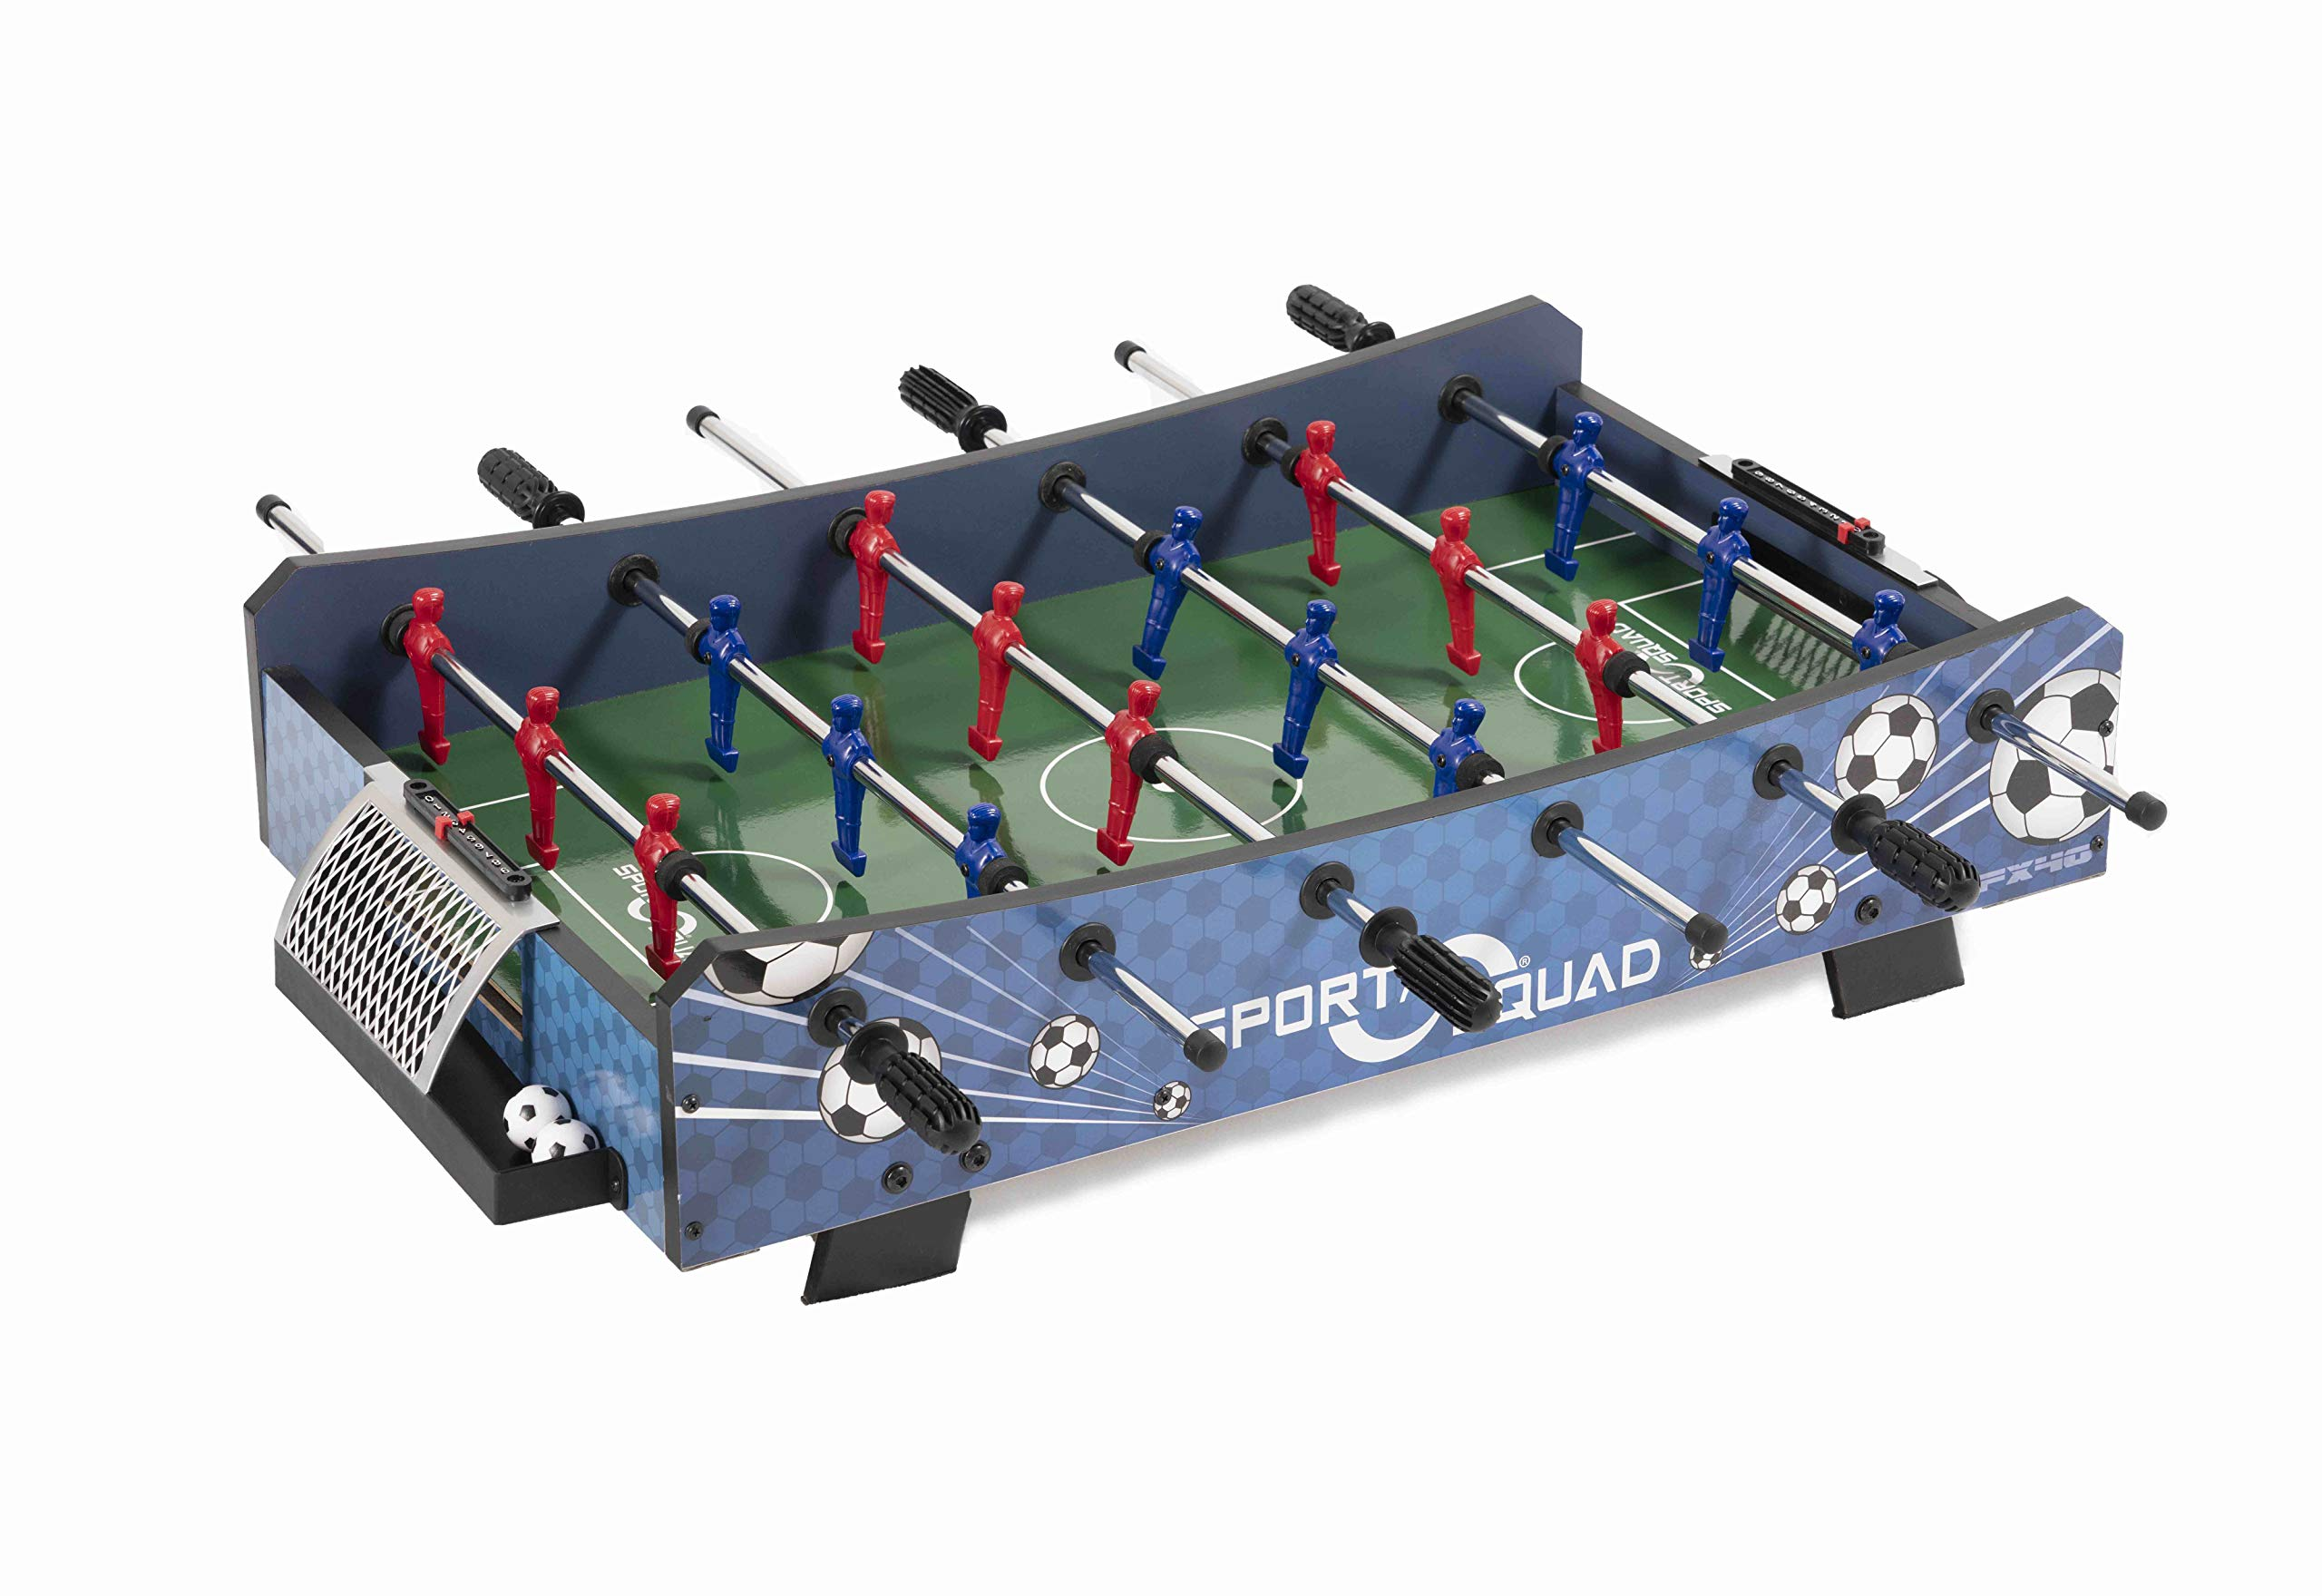 Sport Squad 40 inch Tabletop Foosball